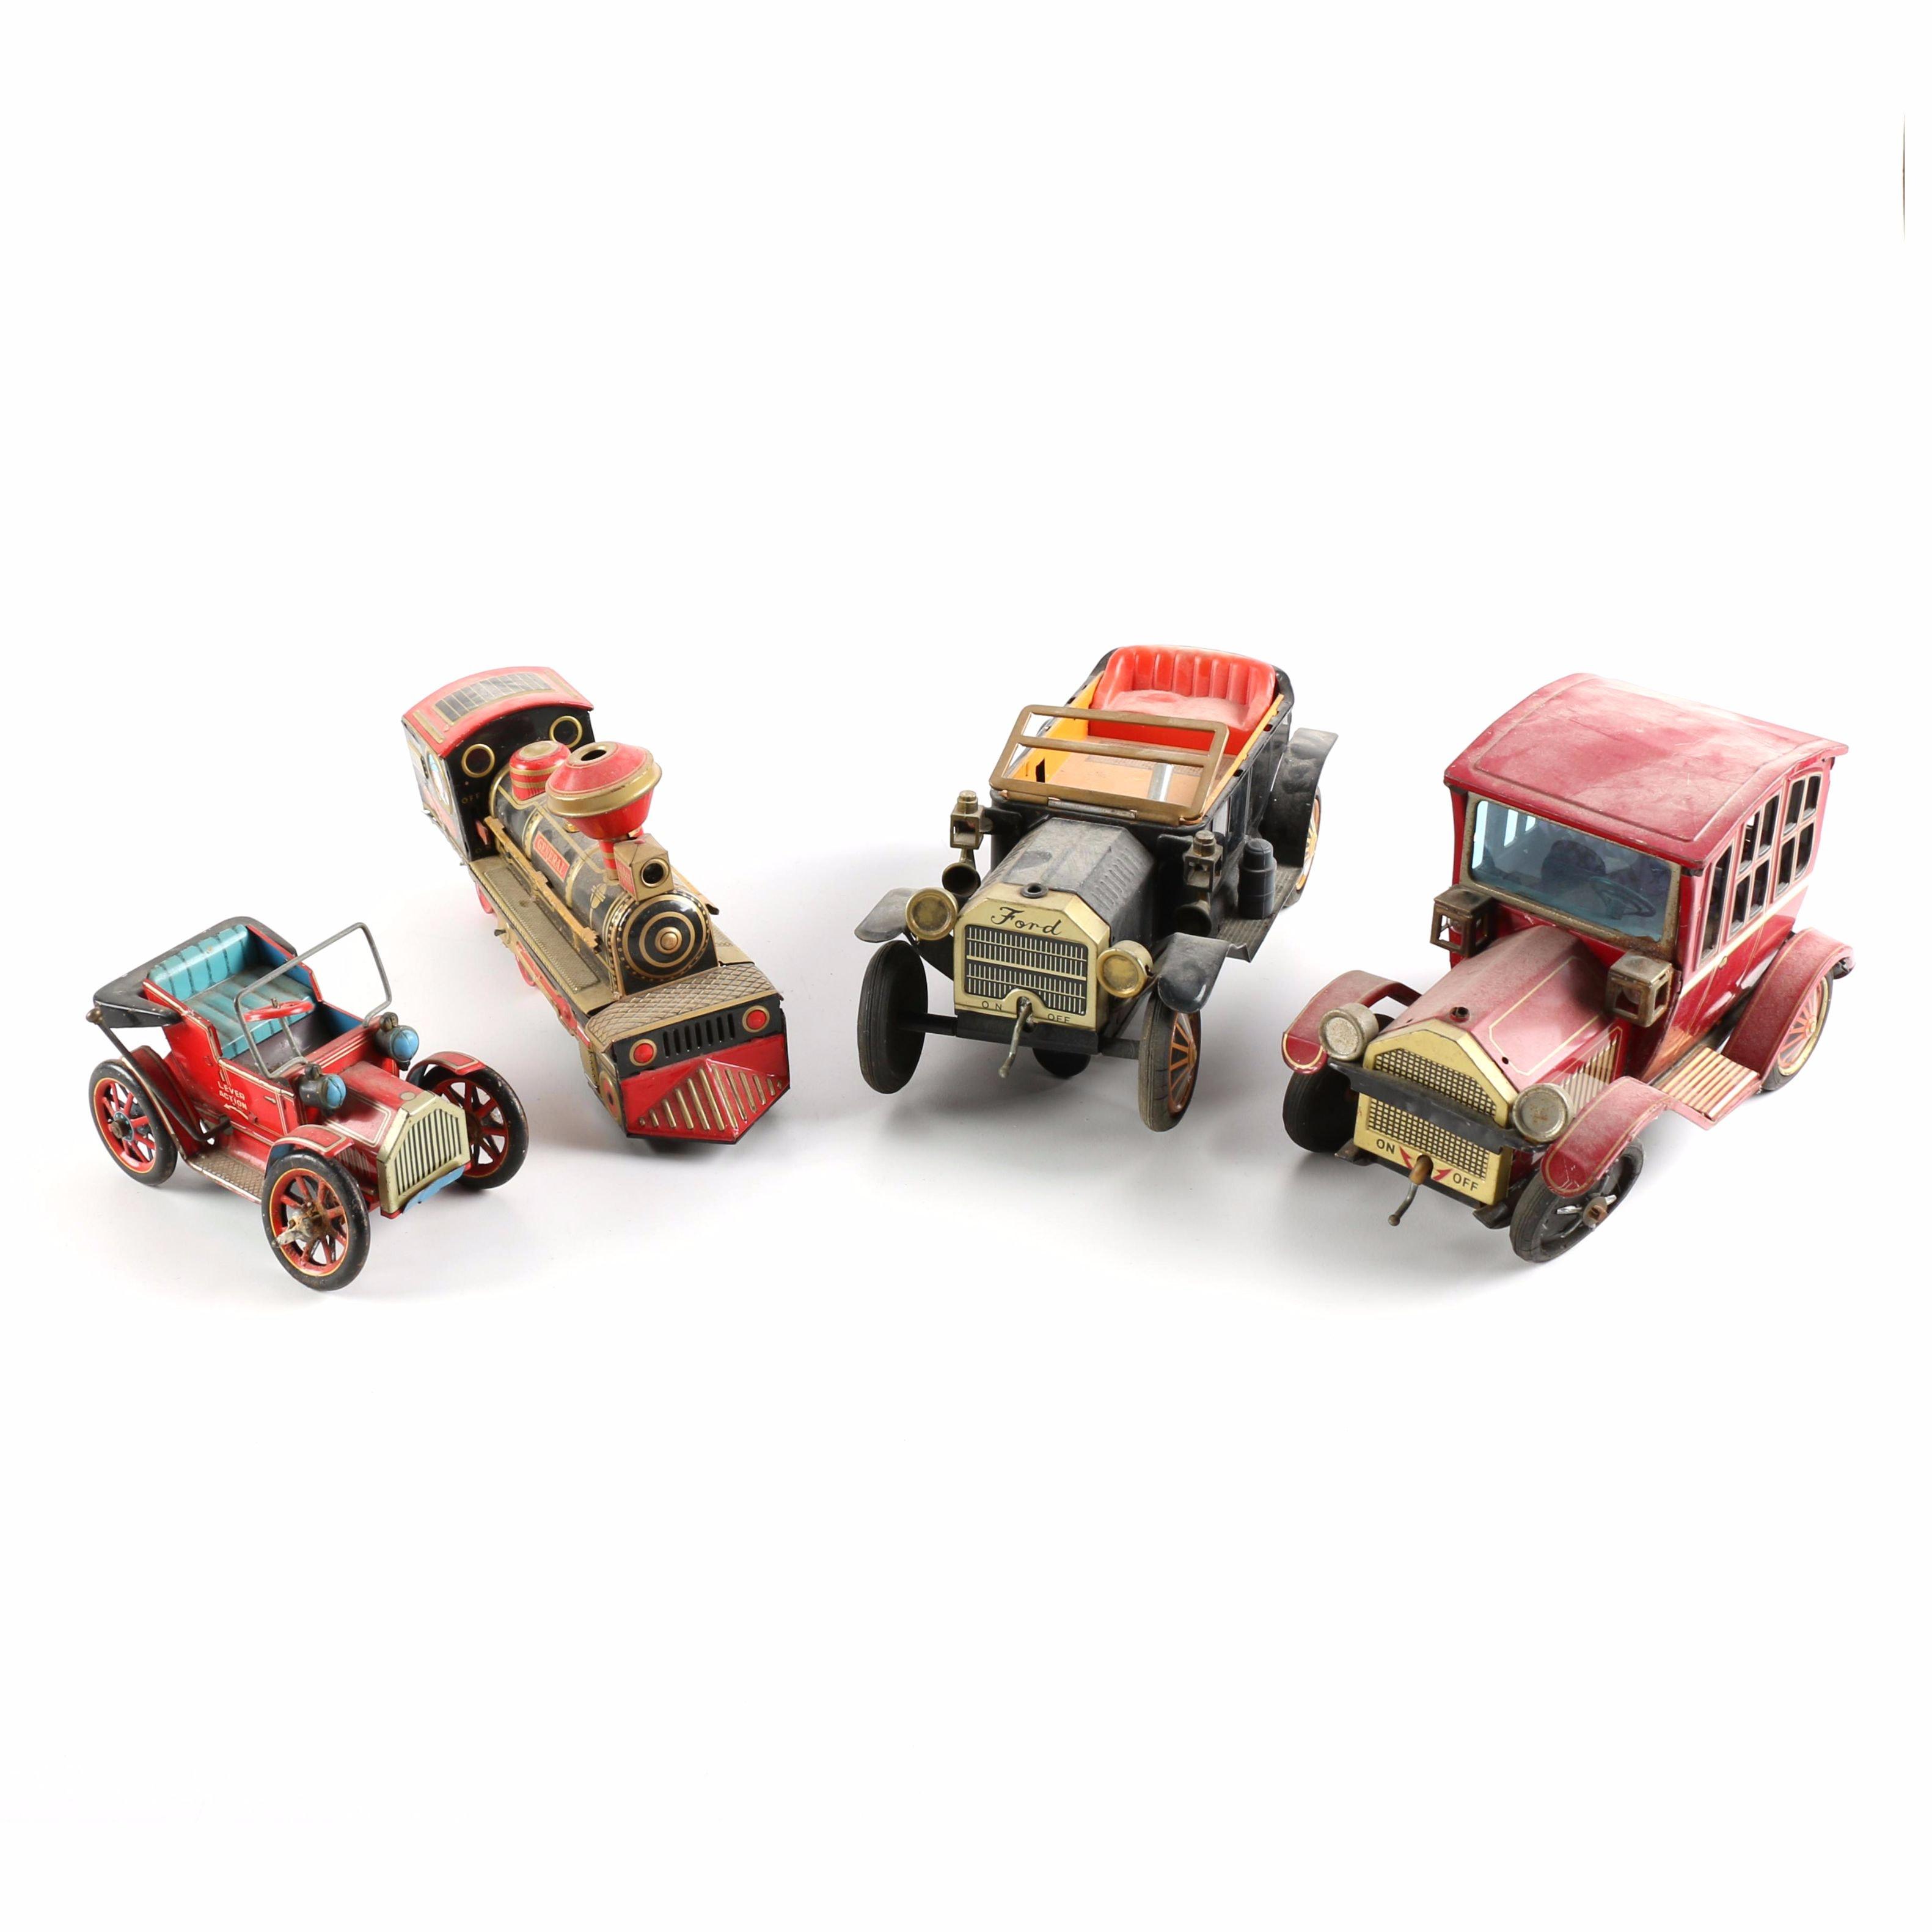 Vintage Metal Movable Vehicle Toys